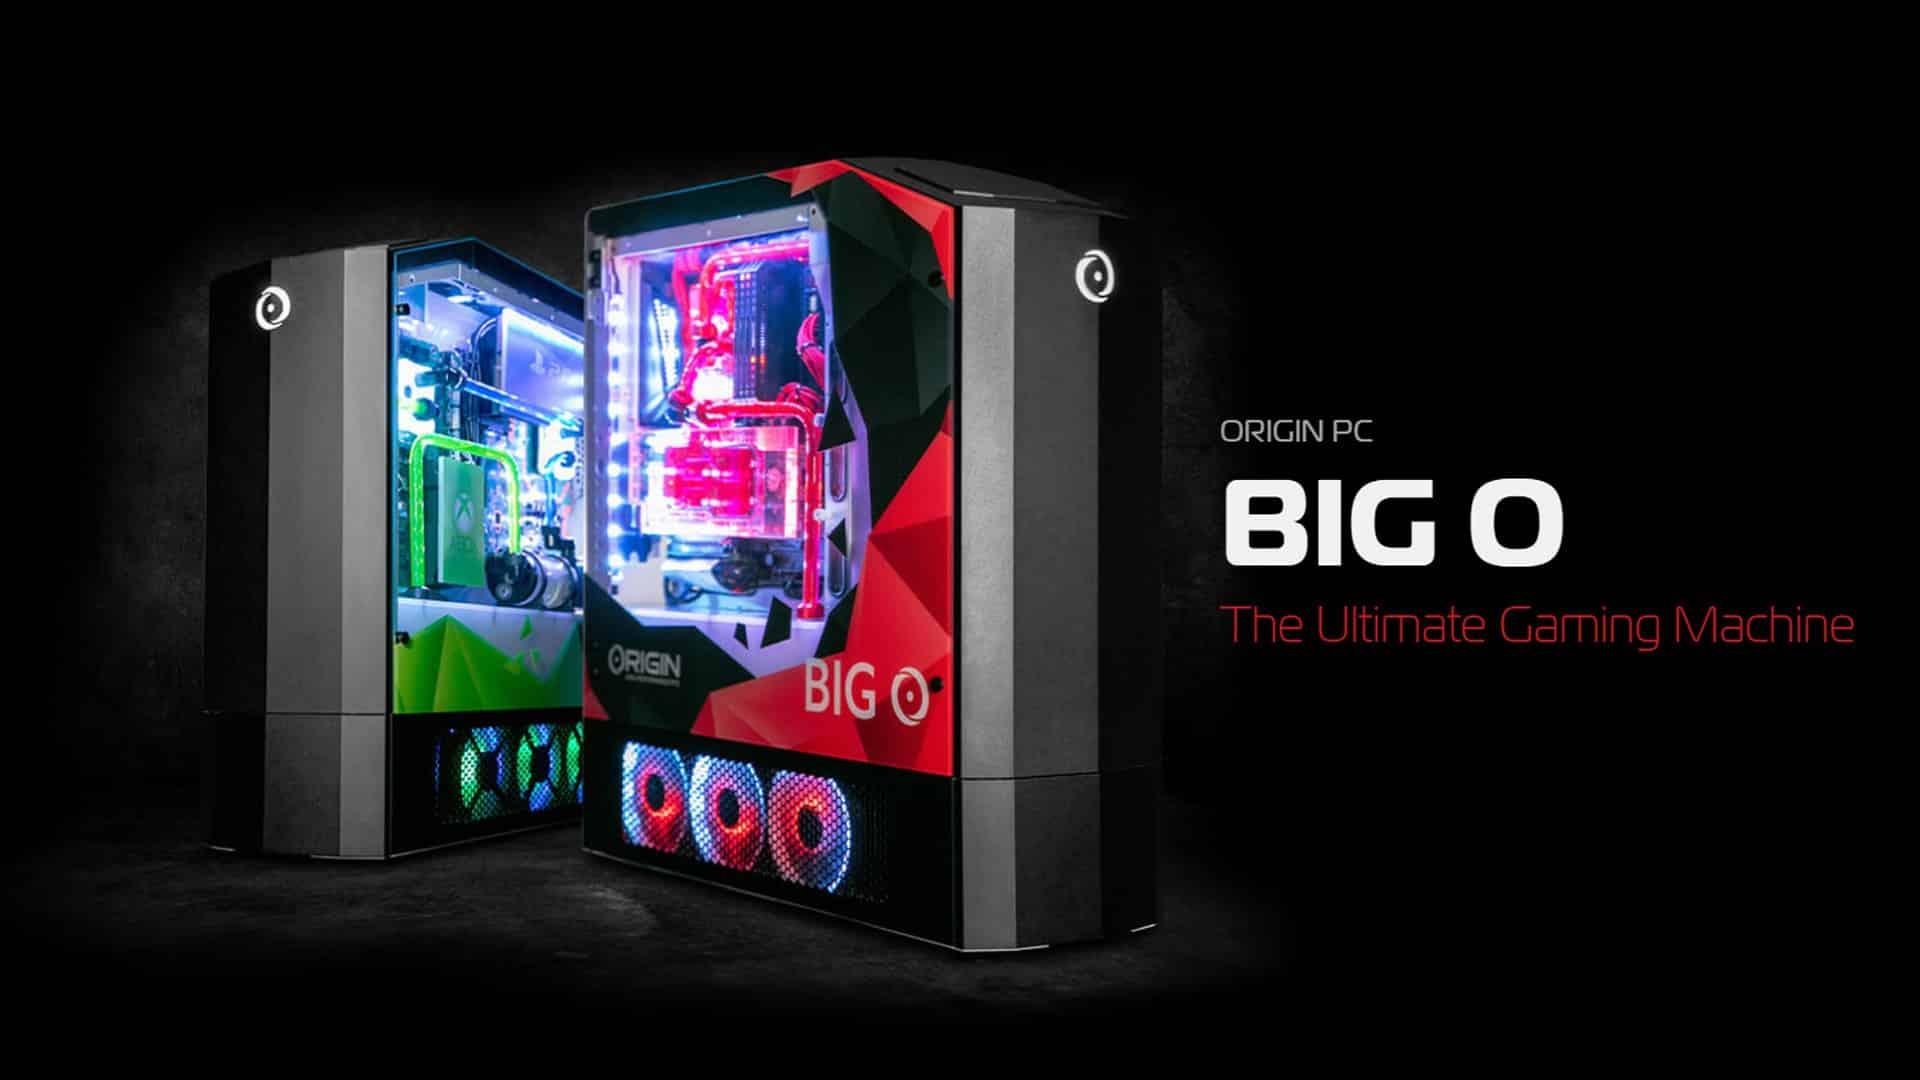 Big O Gaming machine